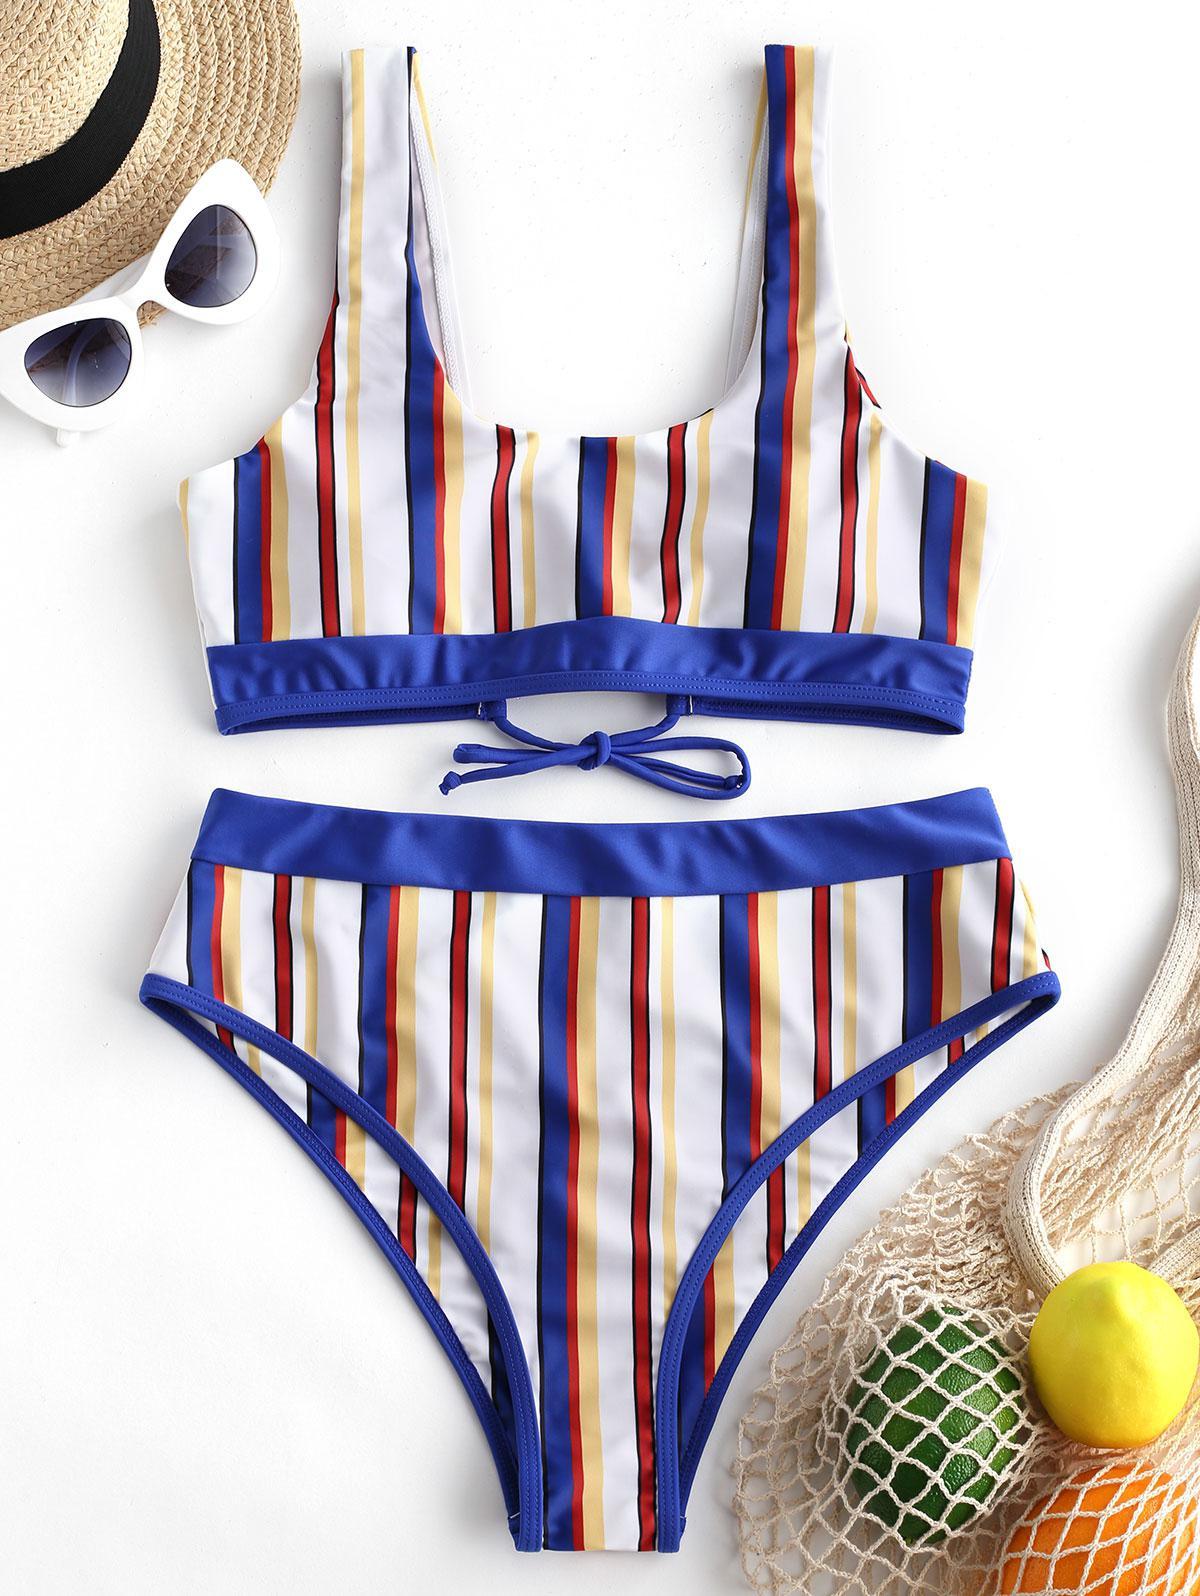 ZAFUL Multi Stripe Lace-up Tank Bikini Swimsuit, Multi-a